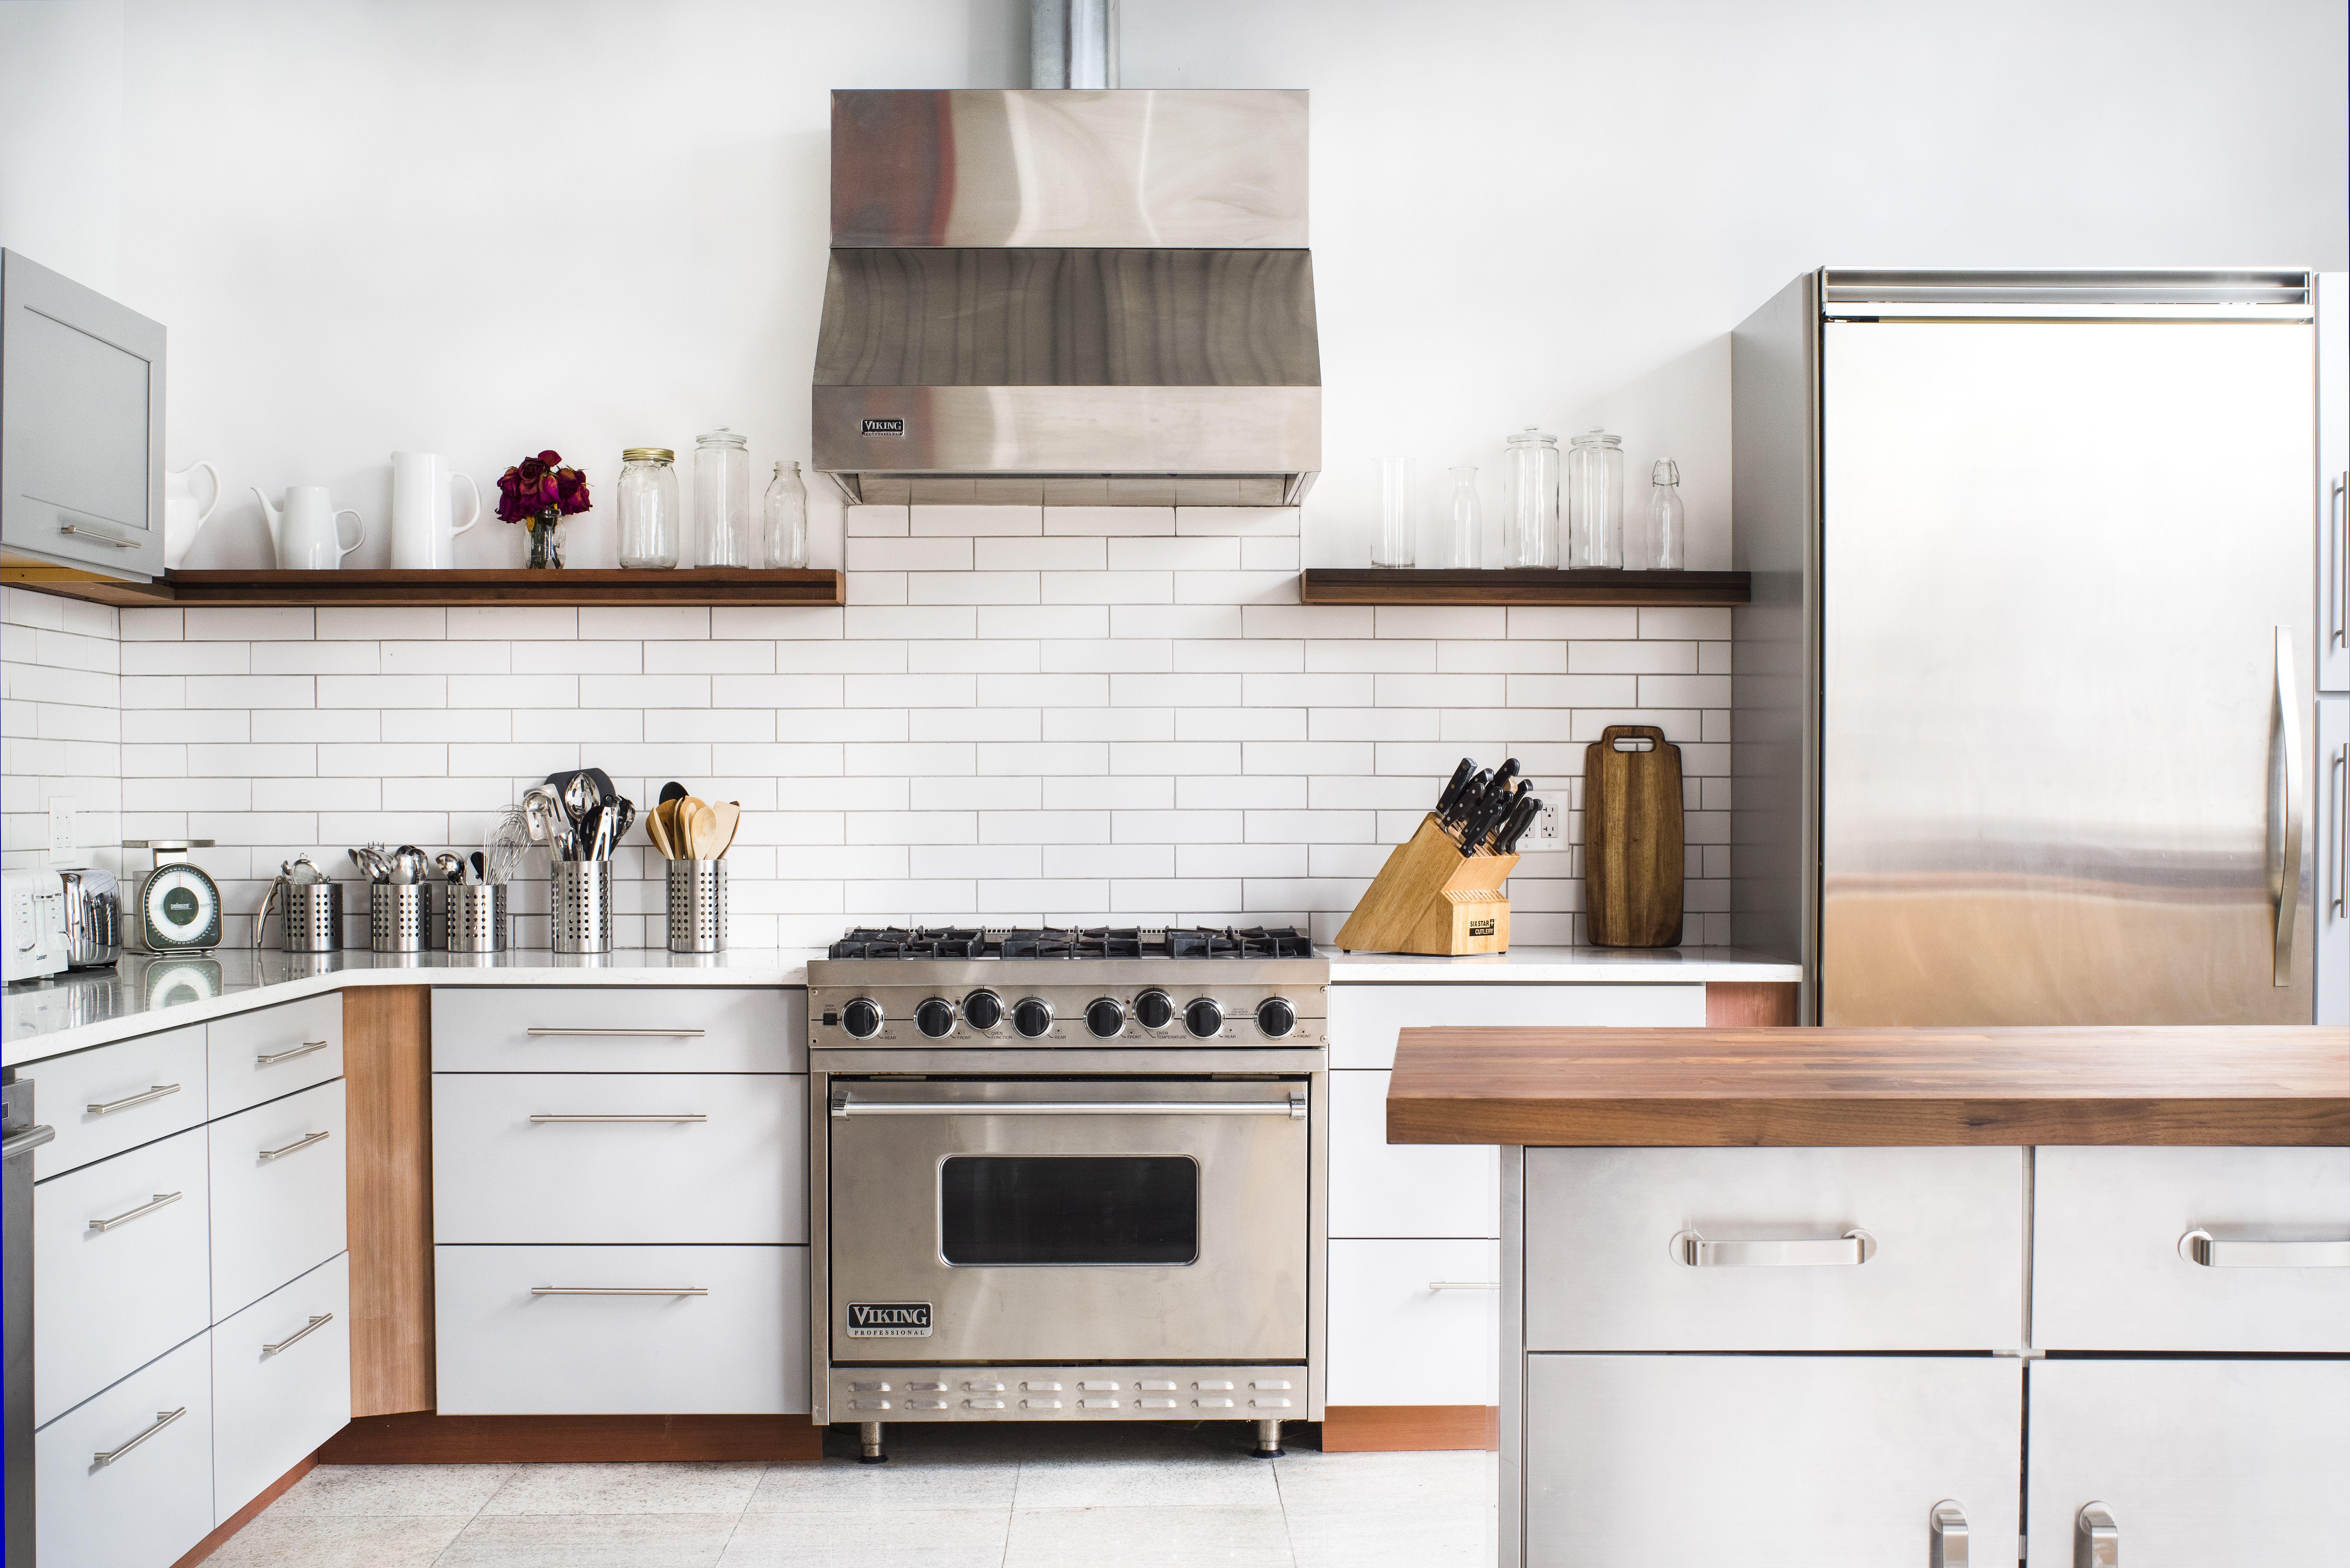 The Gourmet Prep Shoot Kitchen At Bond Street Studio Features